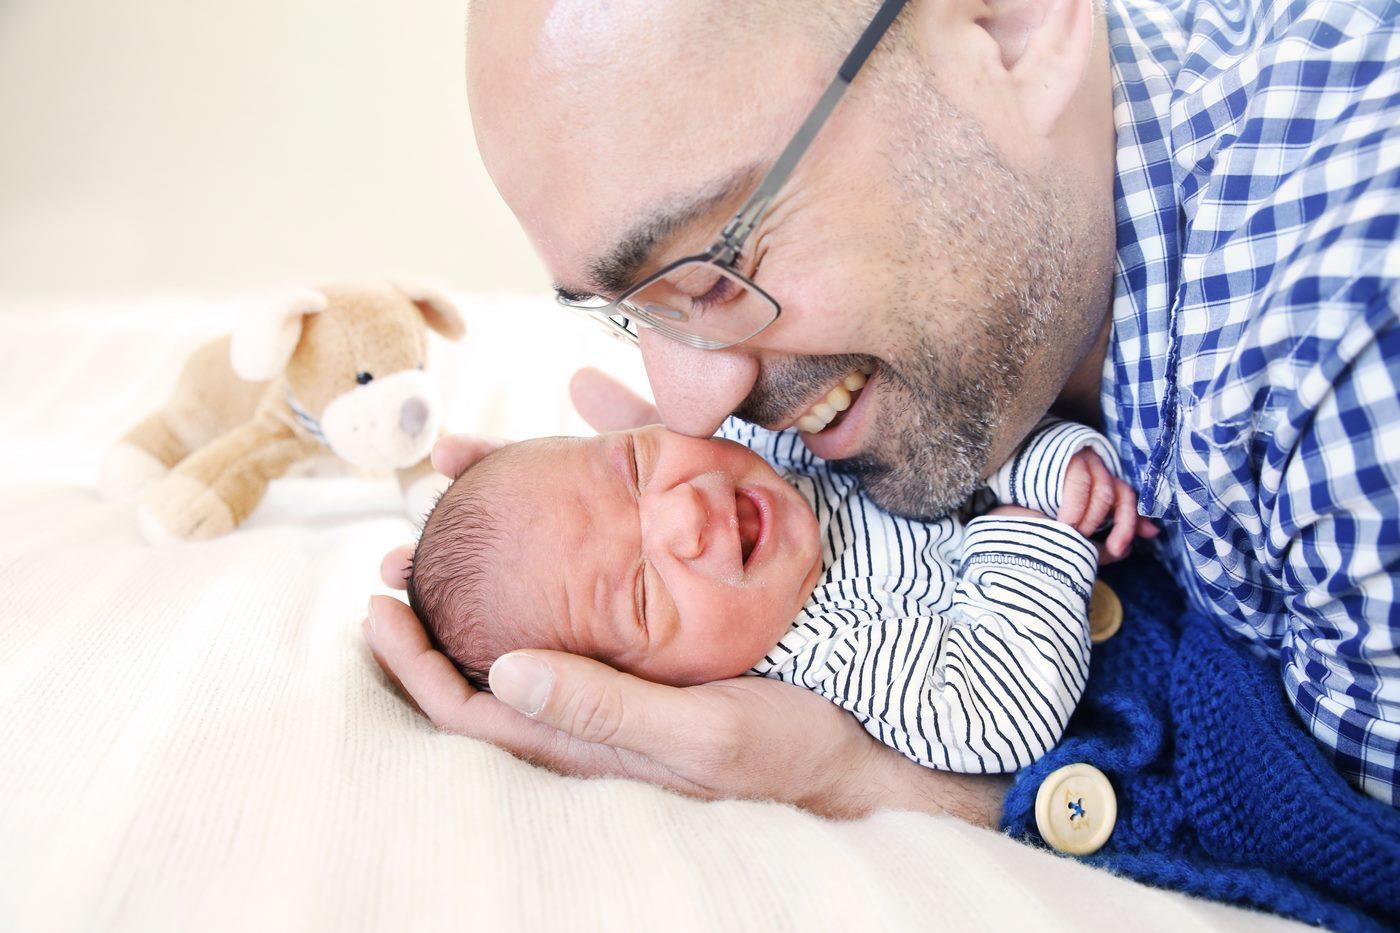 Vater lacht sein neugeborenes Baby an